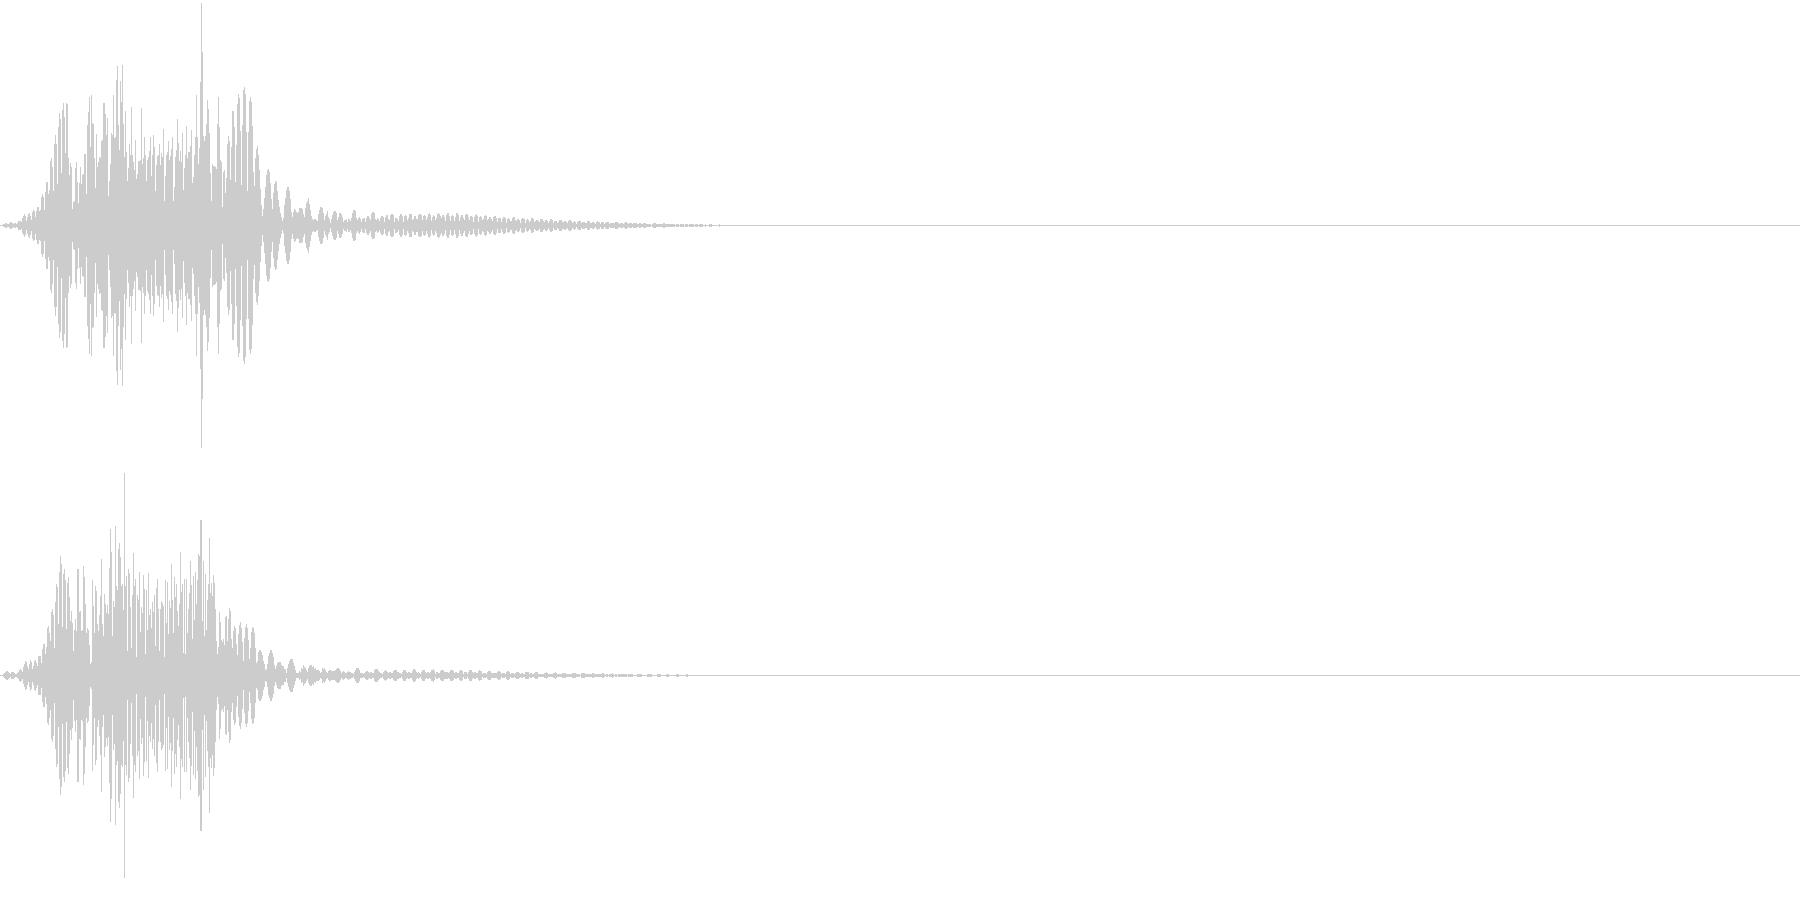 Push 汎用決定・セレクト音 1の未再生の波形